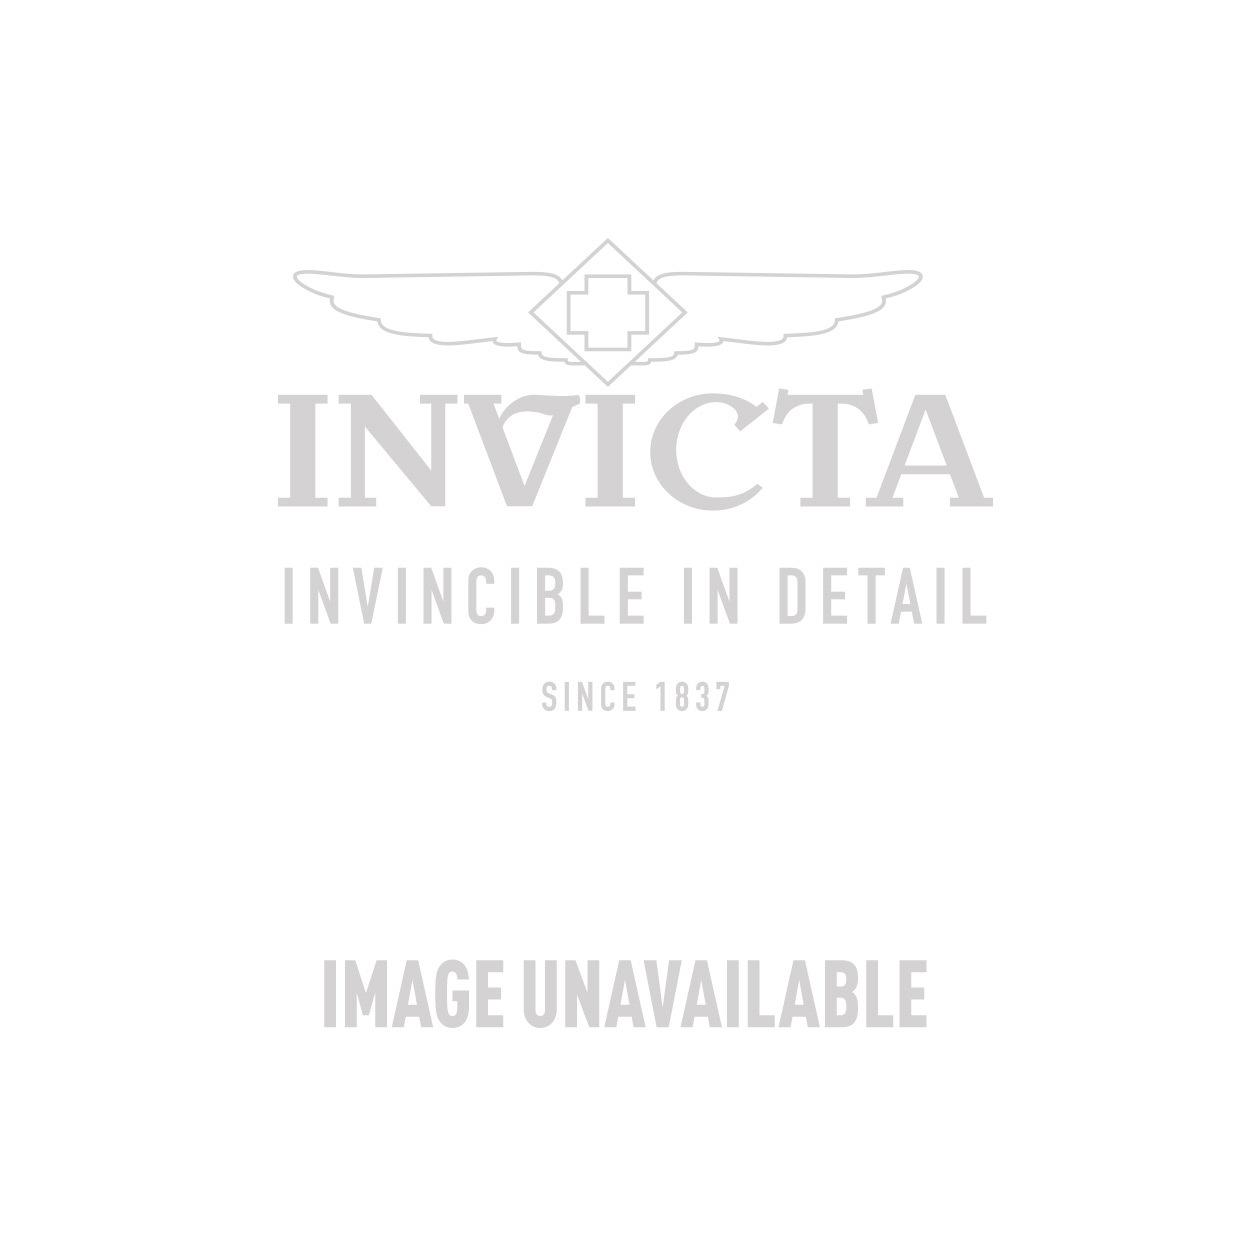 Invicta S1 Rally Quartz Watch - Gold, Blue case with Black, Blue tone Polyurethane band - Model 20108